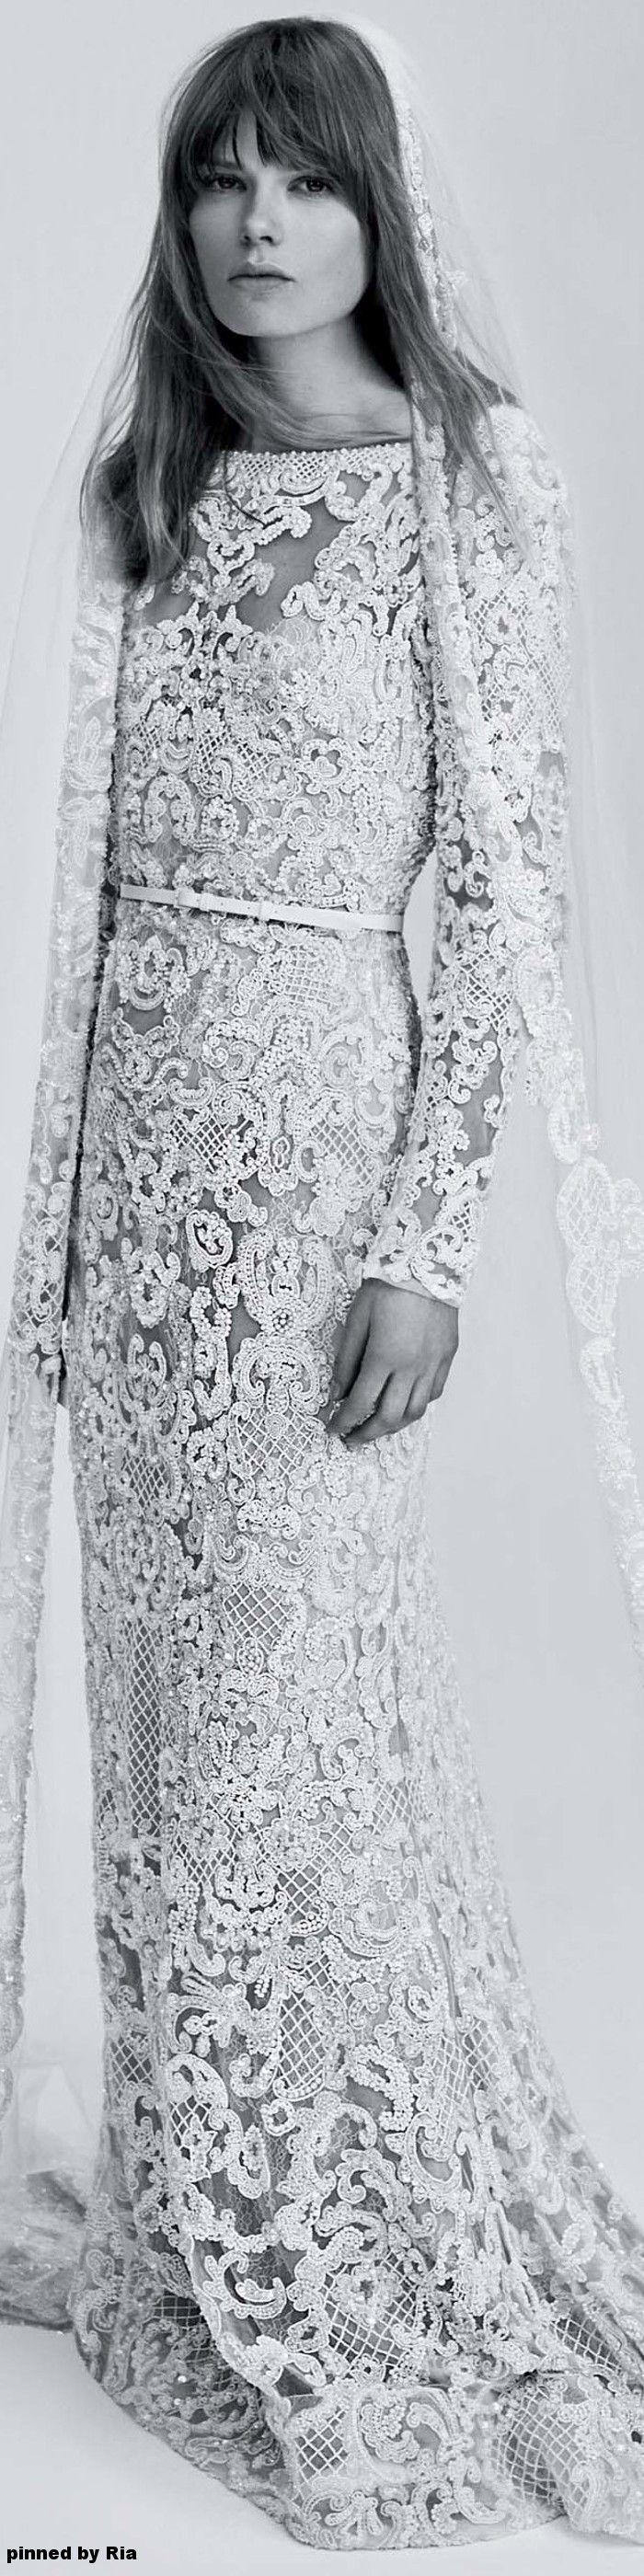 Elie saab bridal spring l ria wedding dresses pinterest